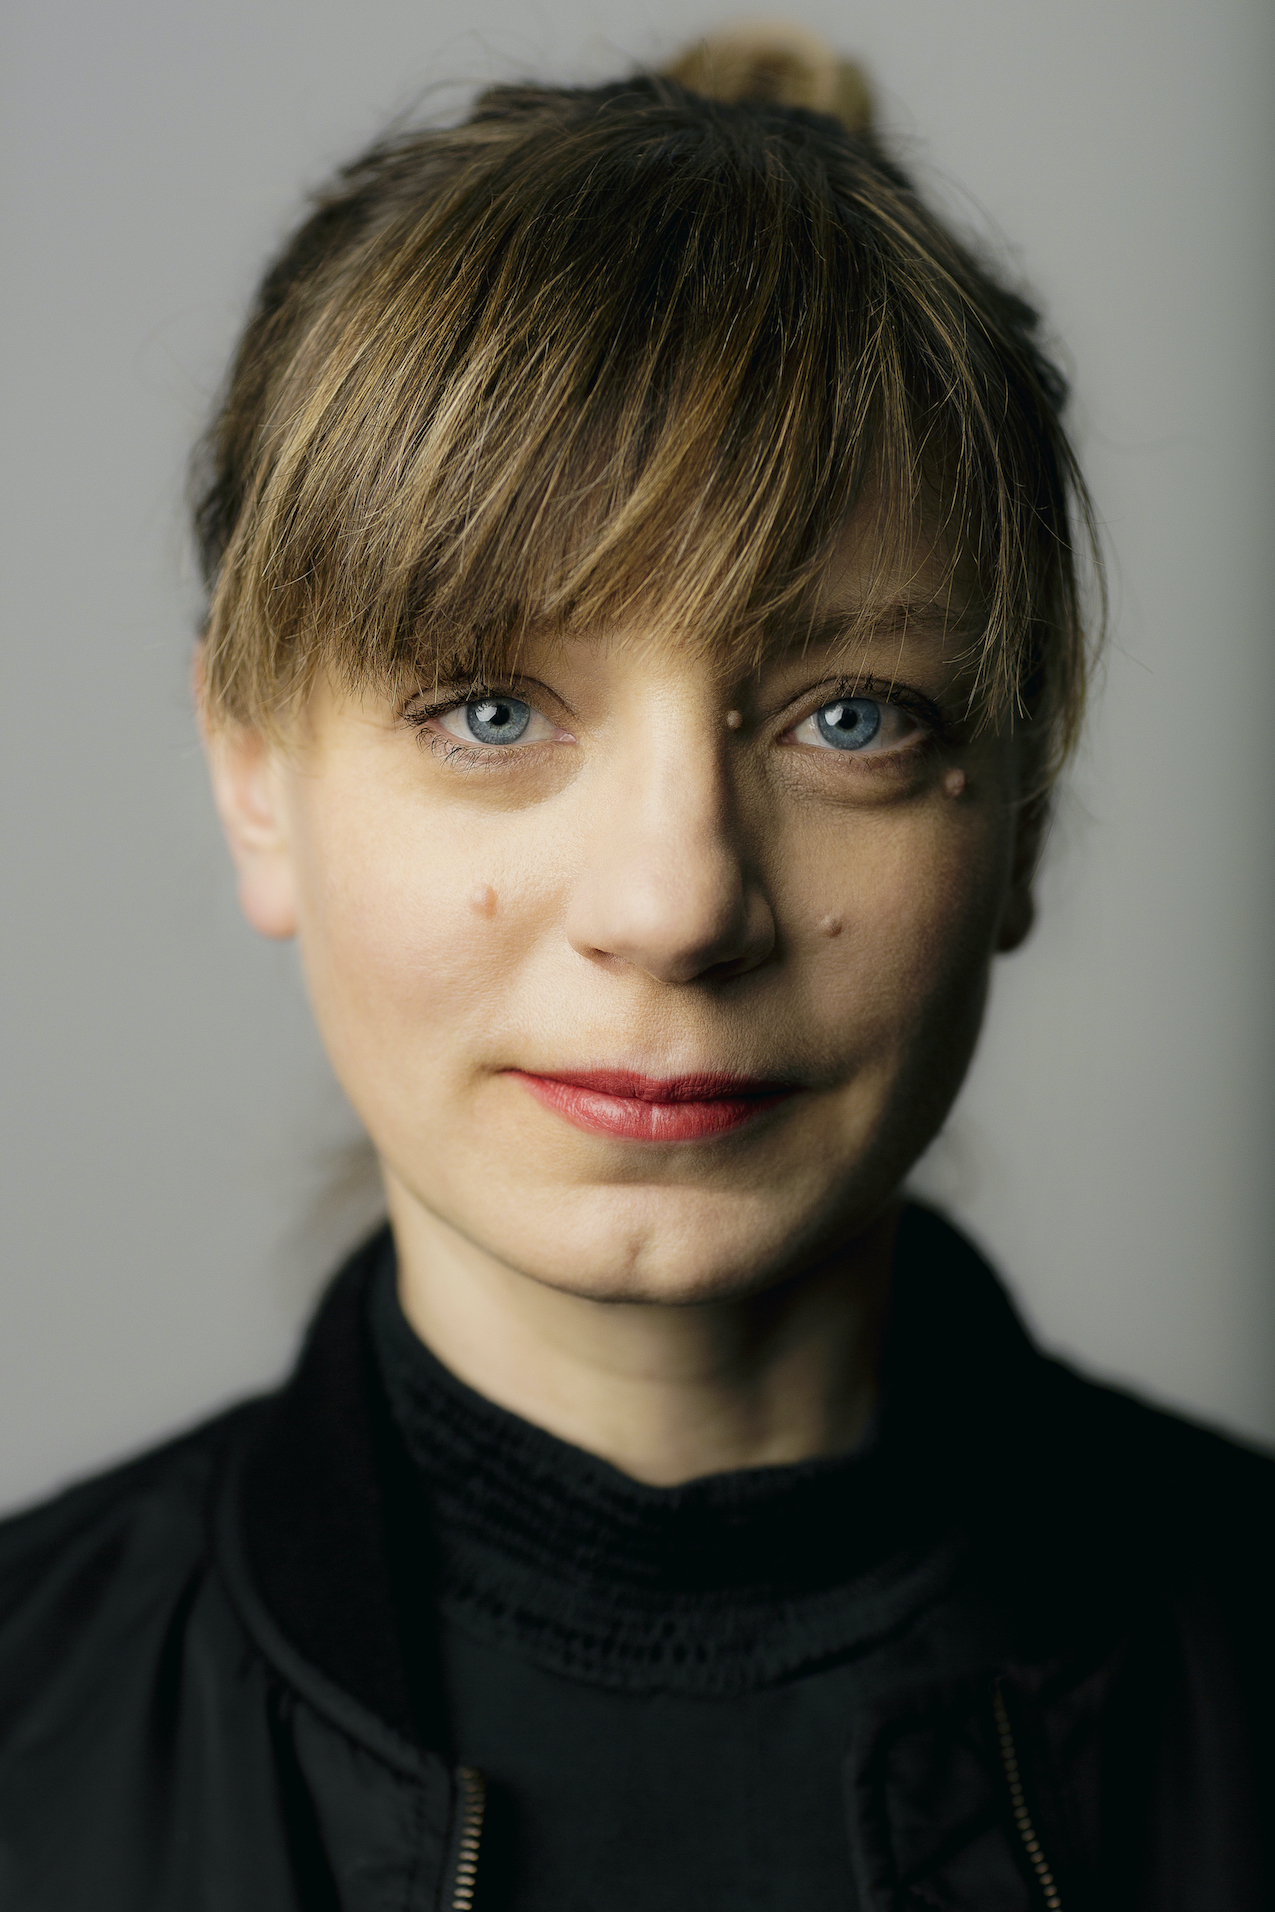 Yvonne Büdenhölzer © Christoph Neumann